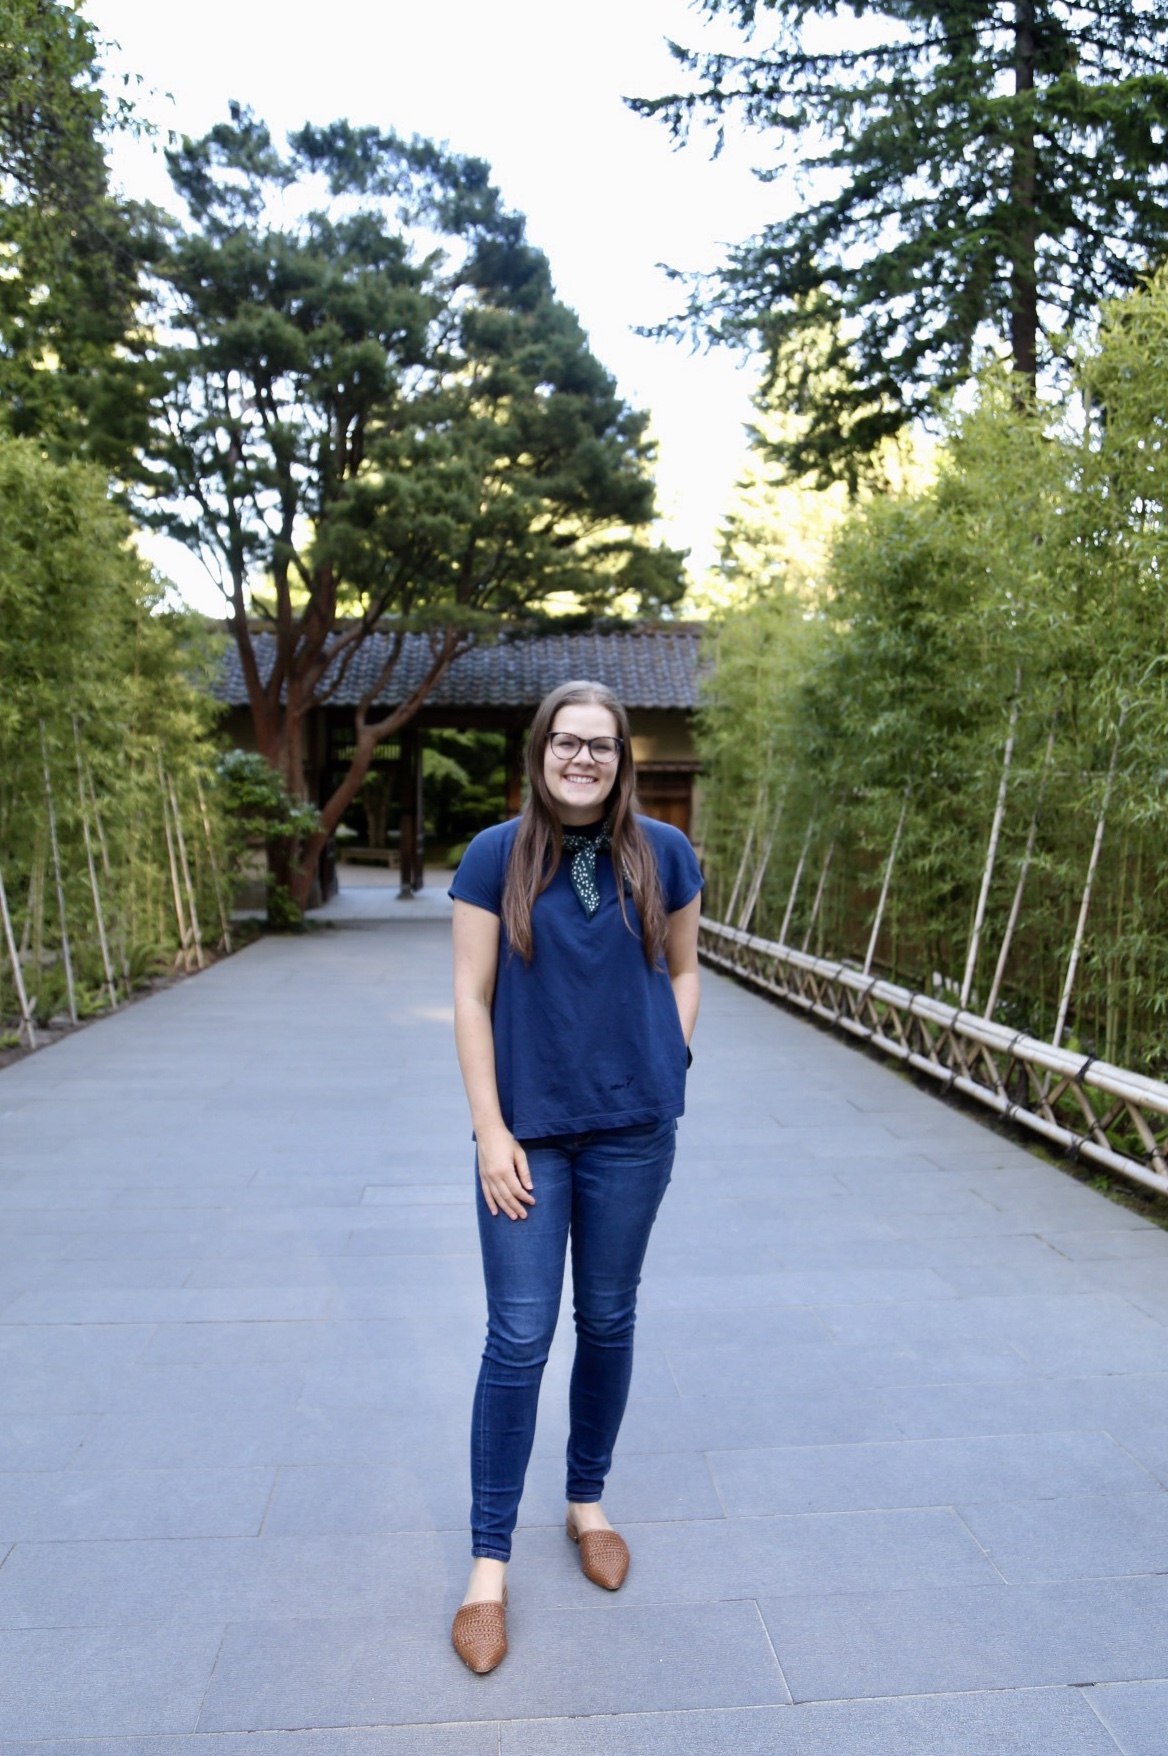 The Ultimate Extended Weekend in Portland, Oregon - Portland Japanese Garden